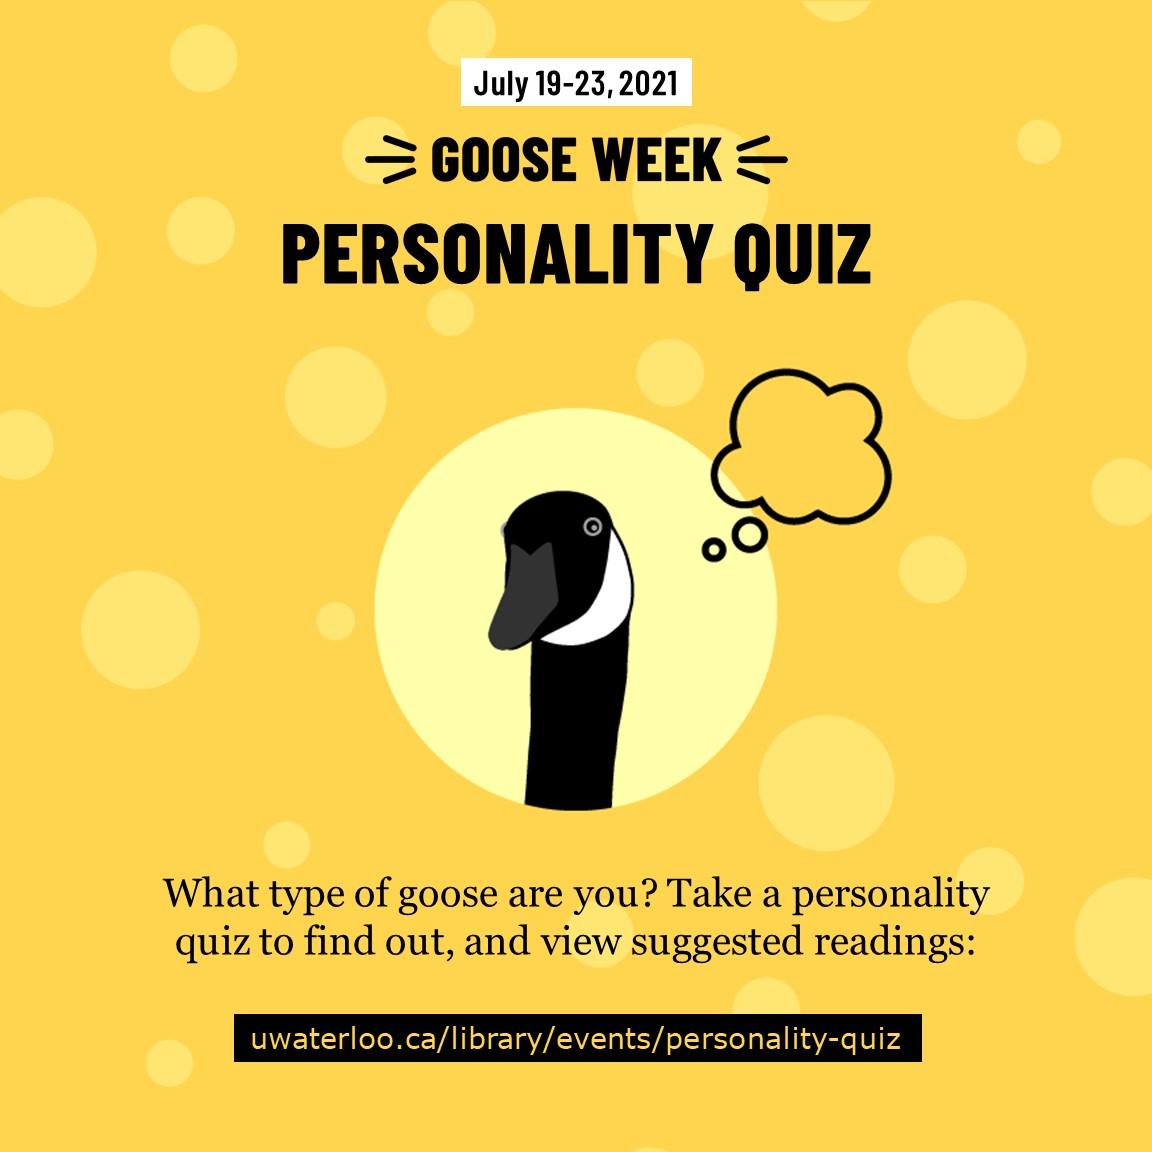 Goose Week 2021 Personality Quiz